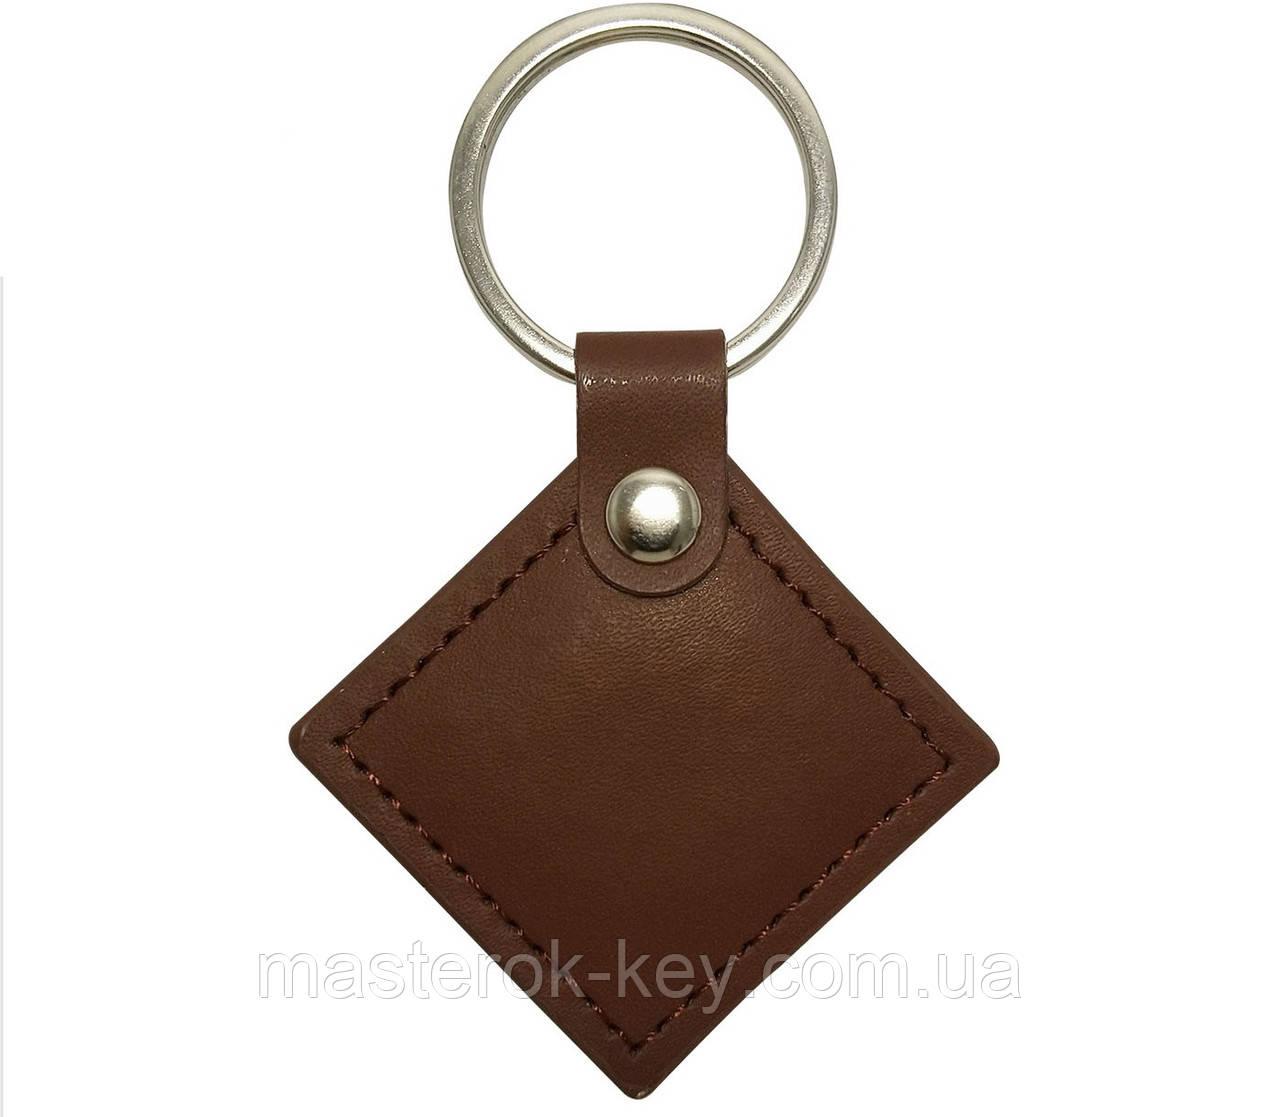 Заготовка ключа для домофона RFID 5577 КОЖА РОМБ КОРИЧНЕВЫЙ